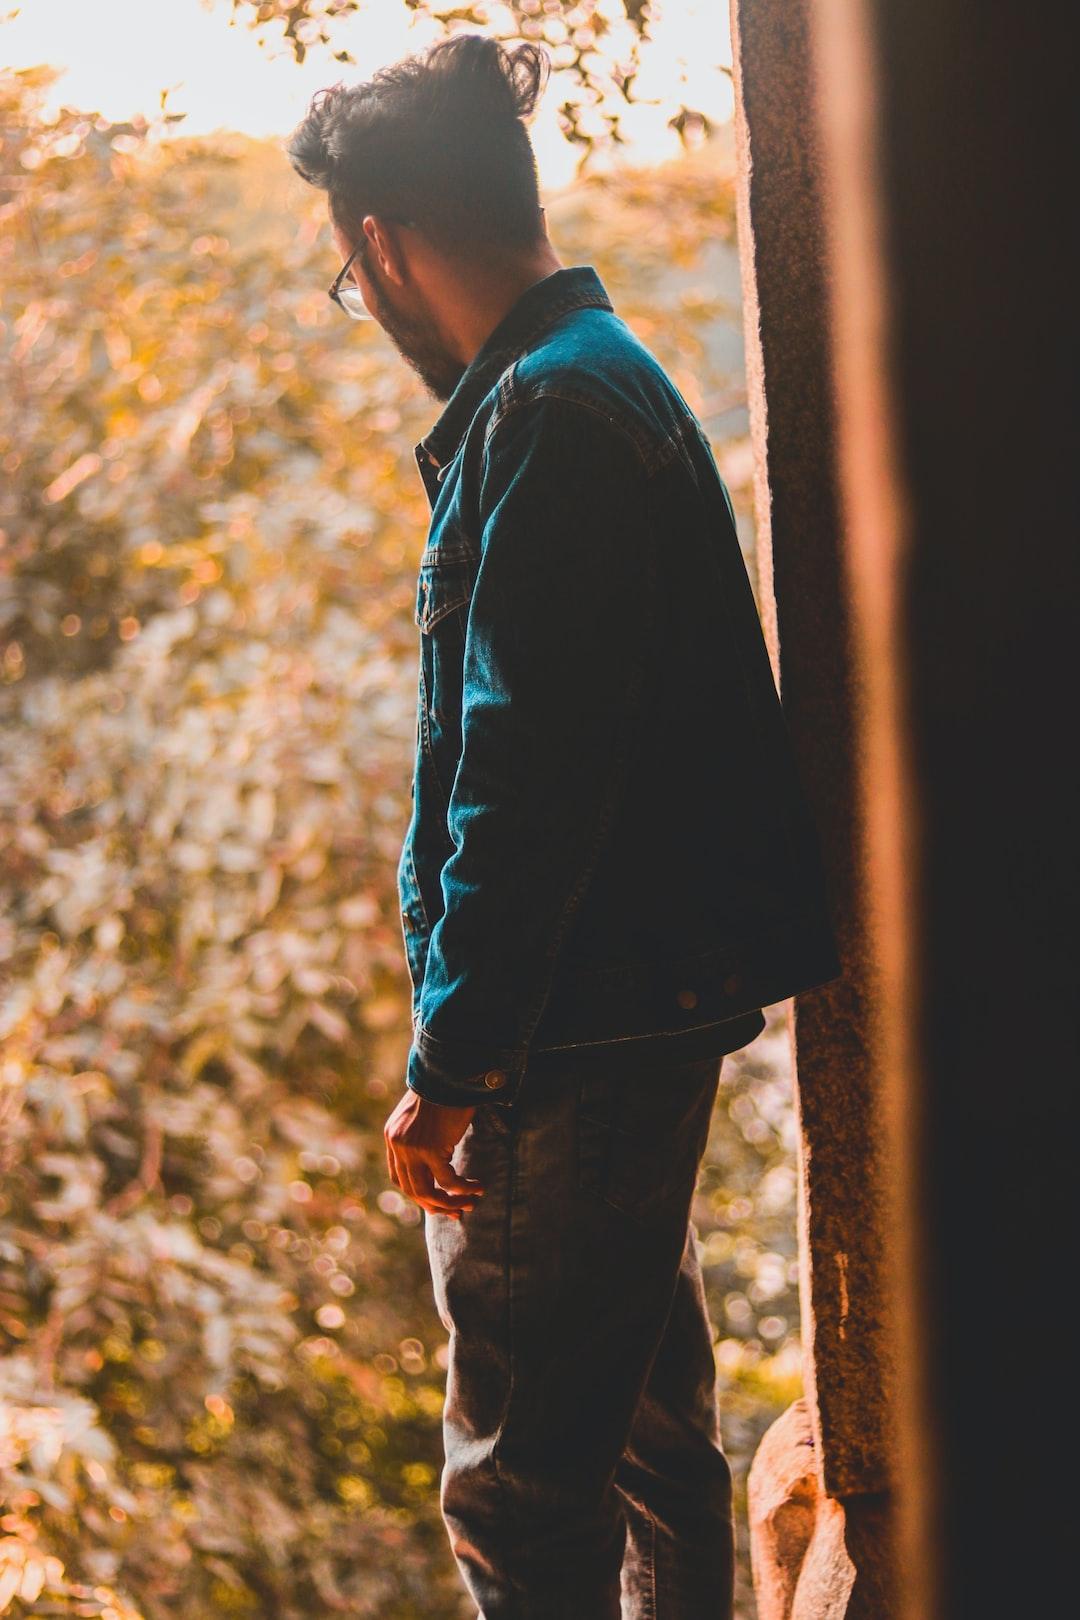 Man standing alone.